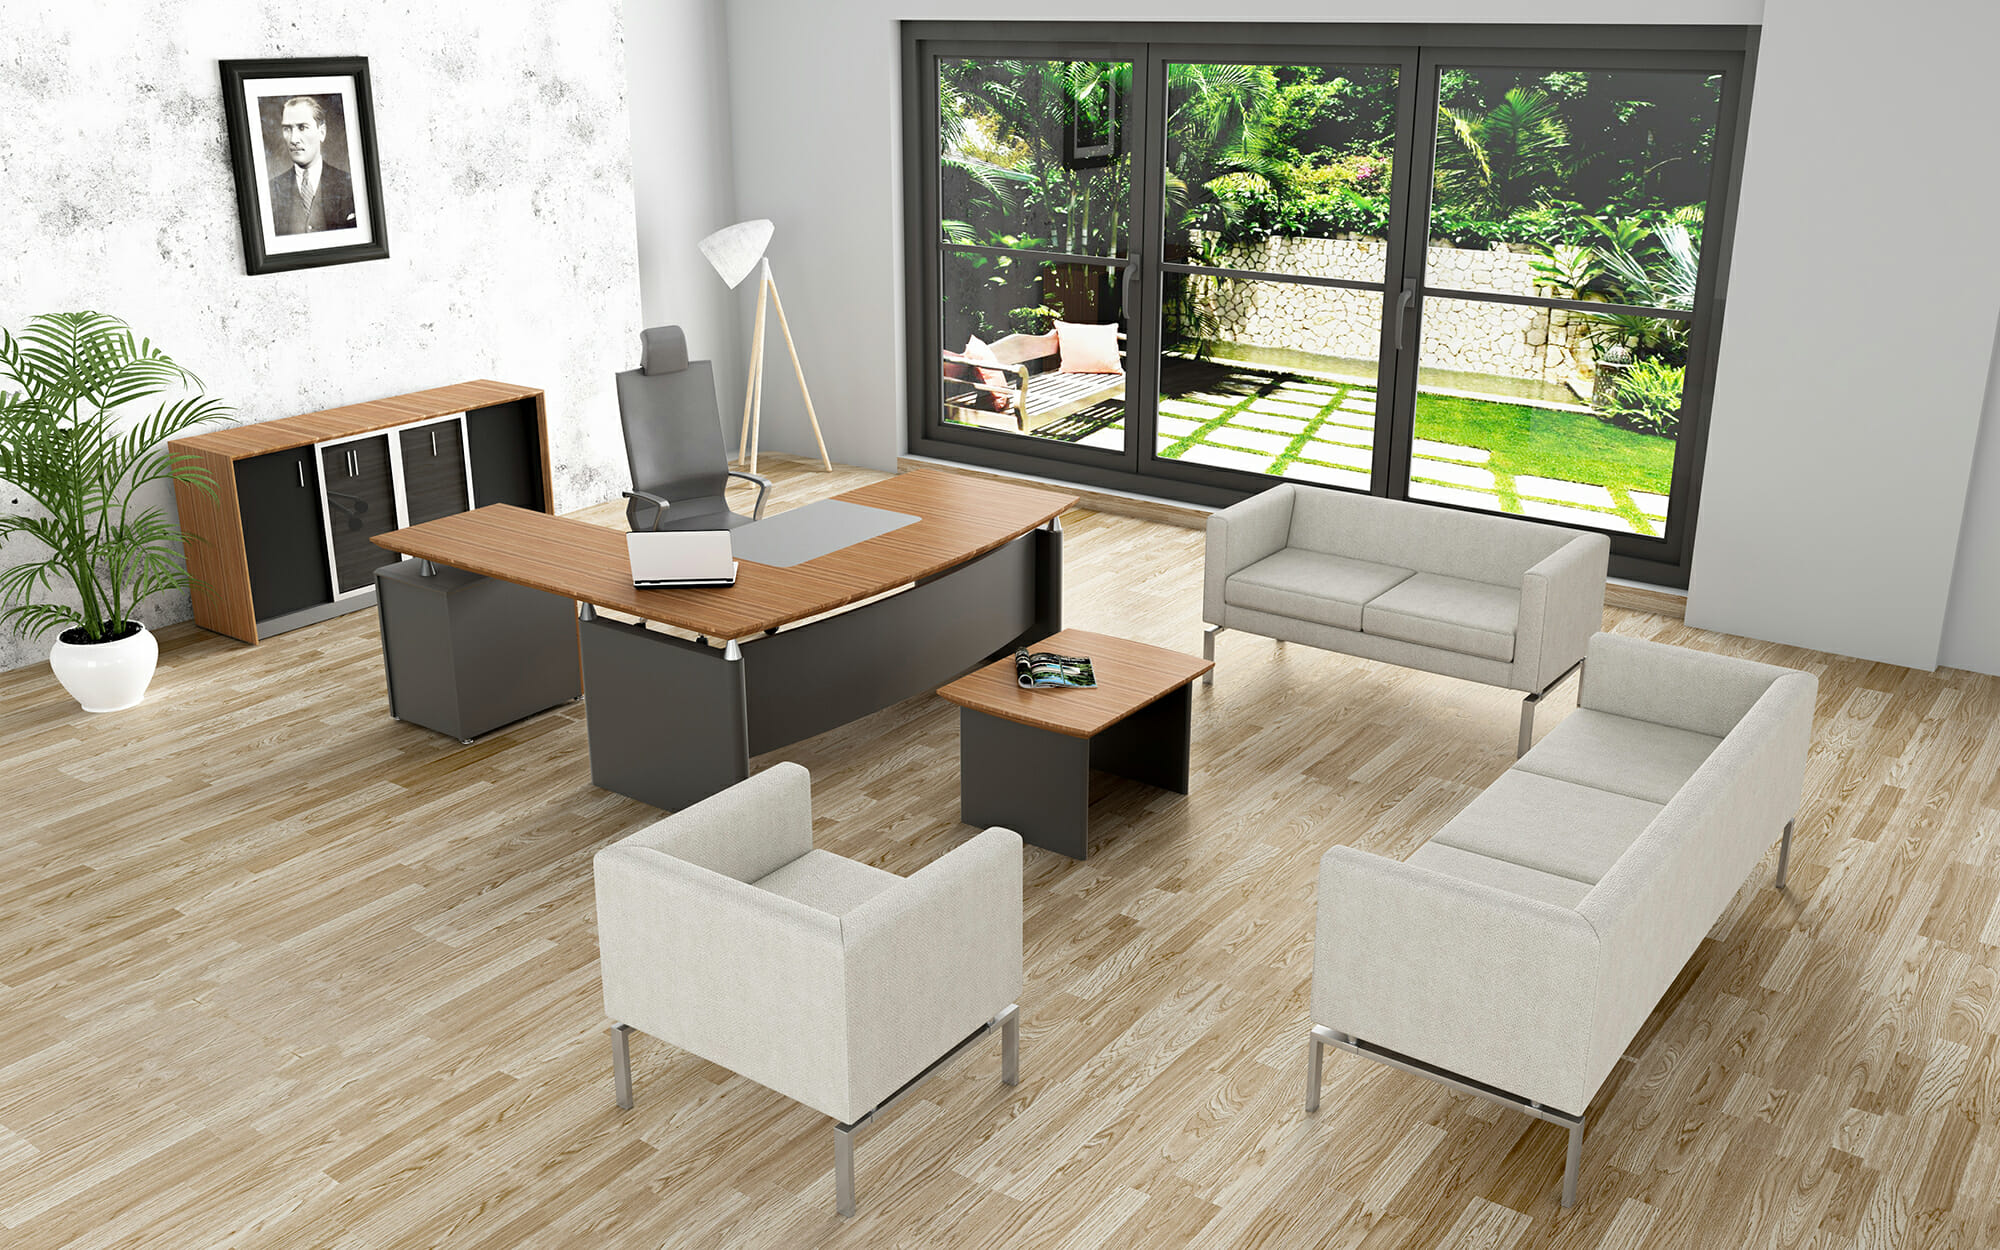 Burosit Office Furnitures